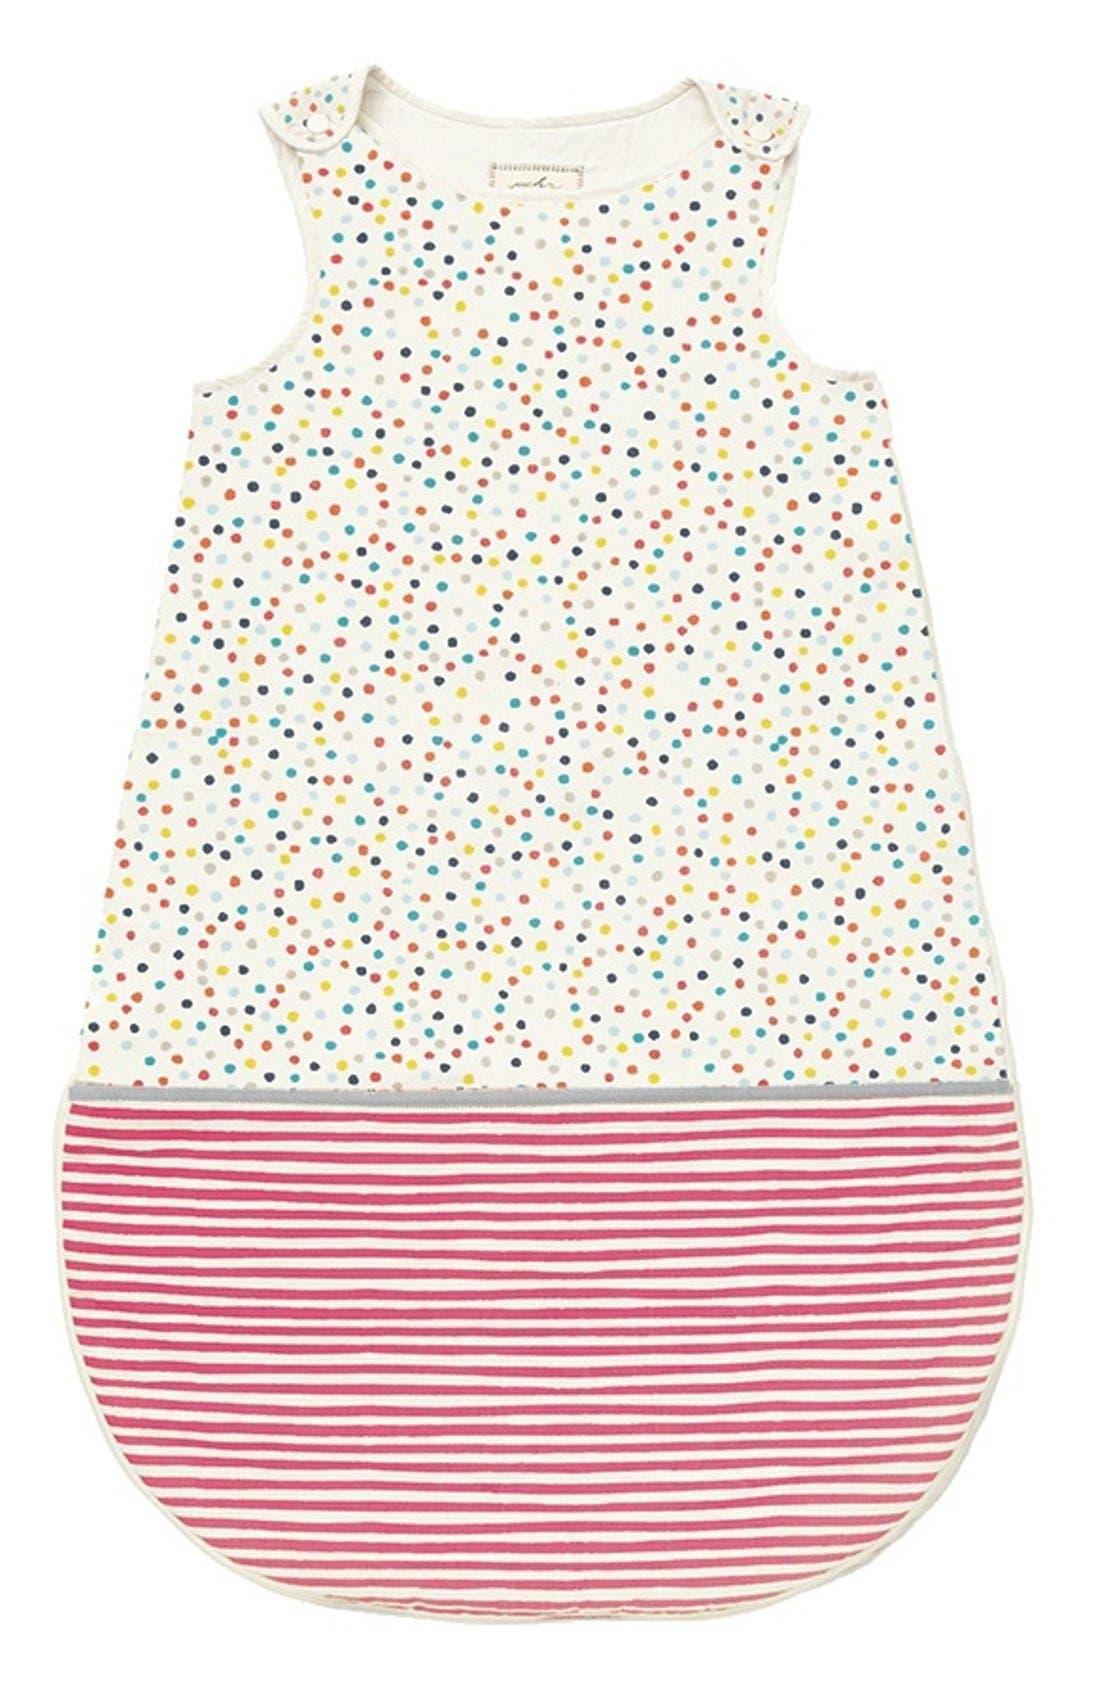 Petit Pehr Cotton Bunting Bag